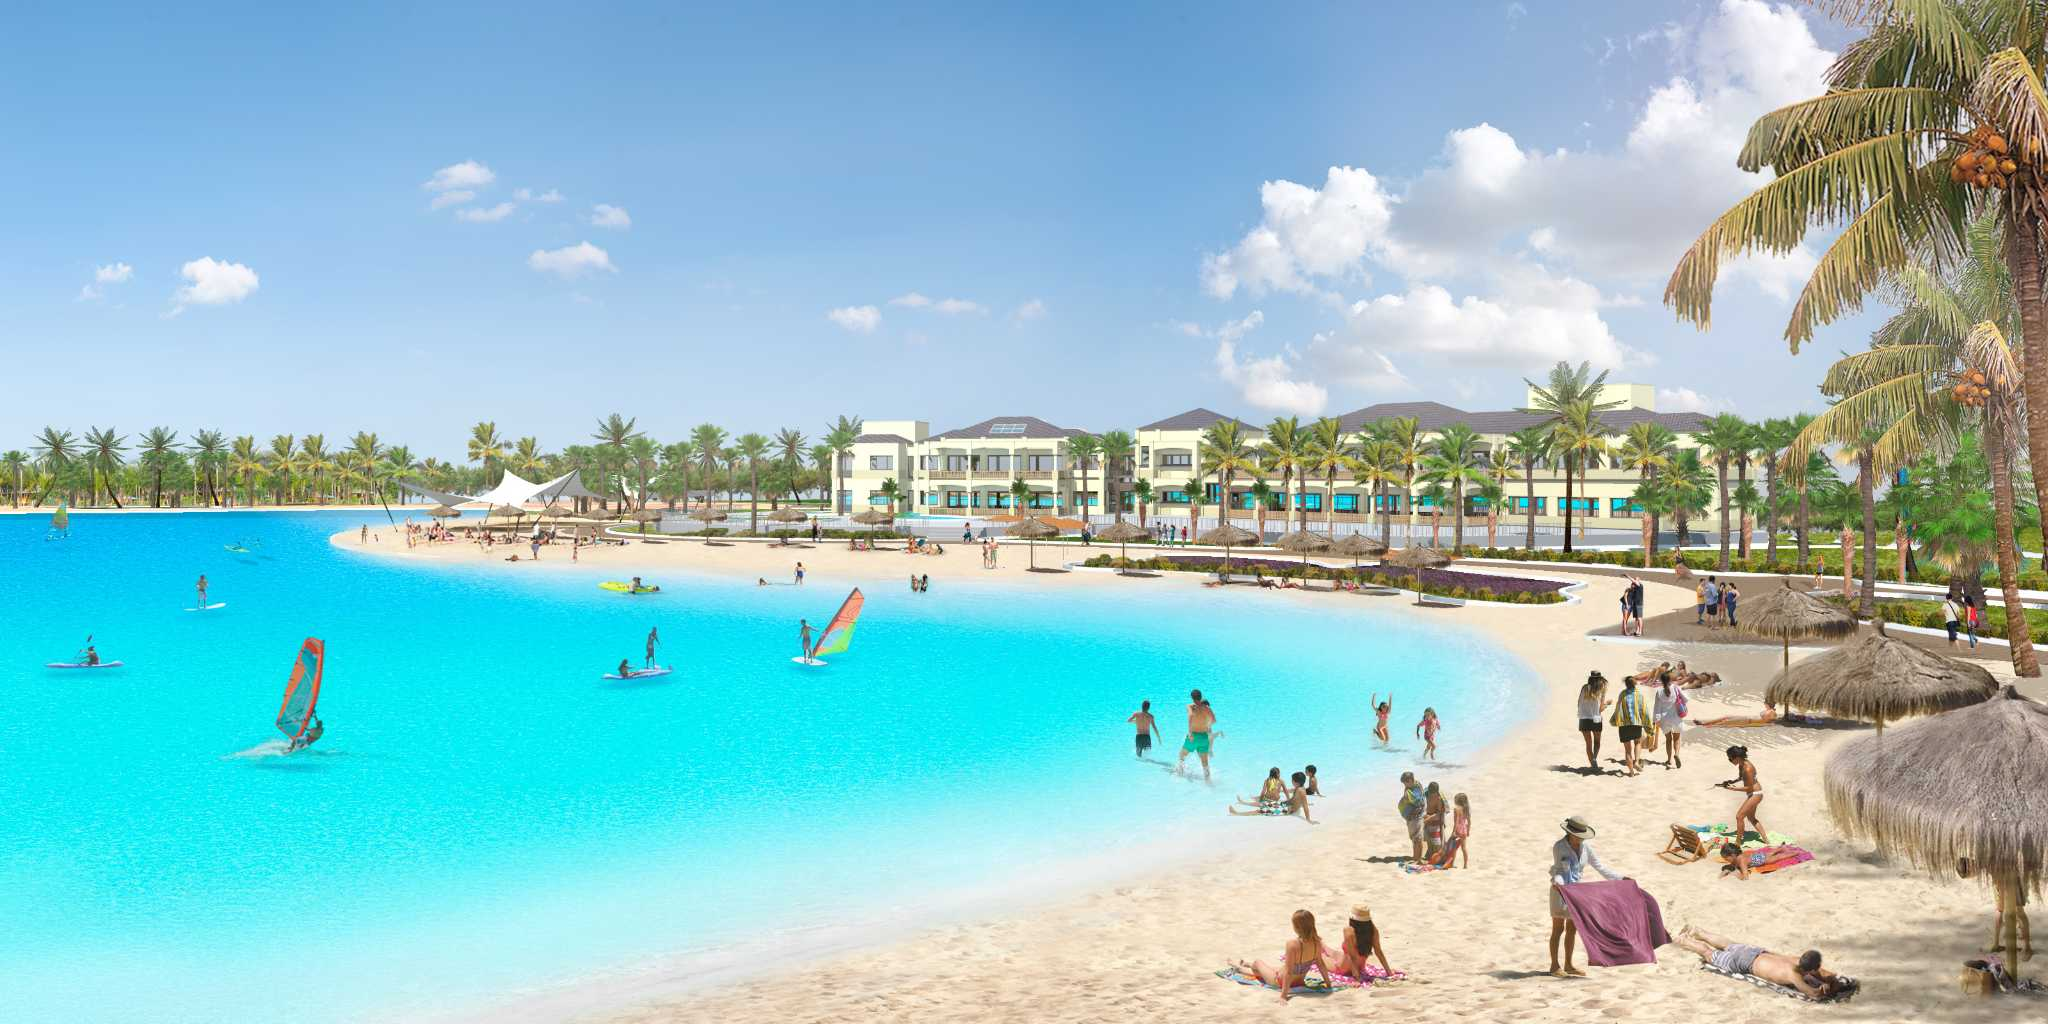 Caribbean Style Lagoon Coming To Houston Area Development